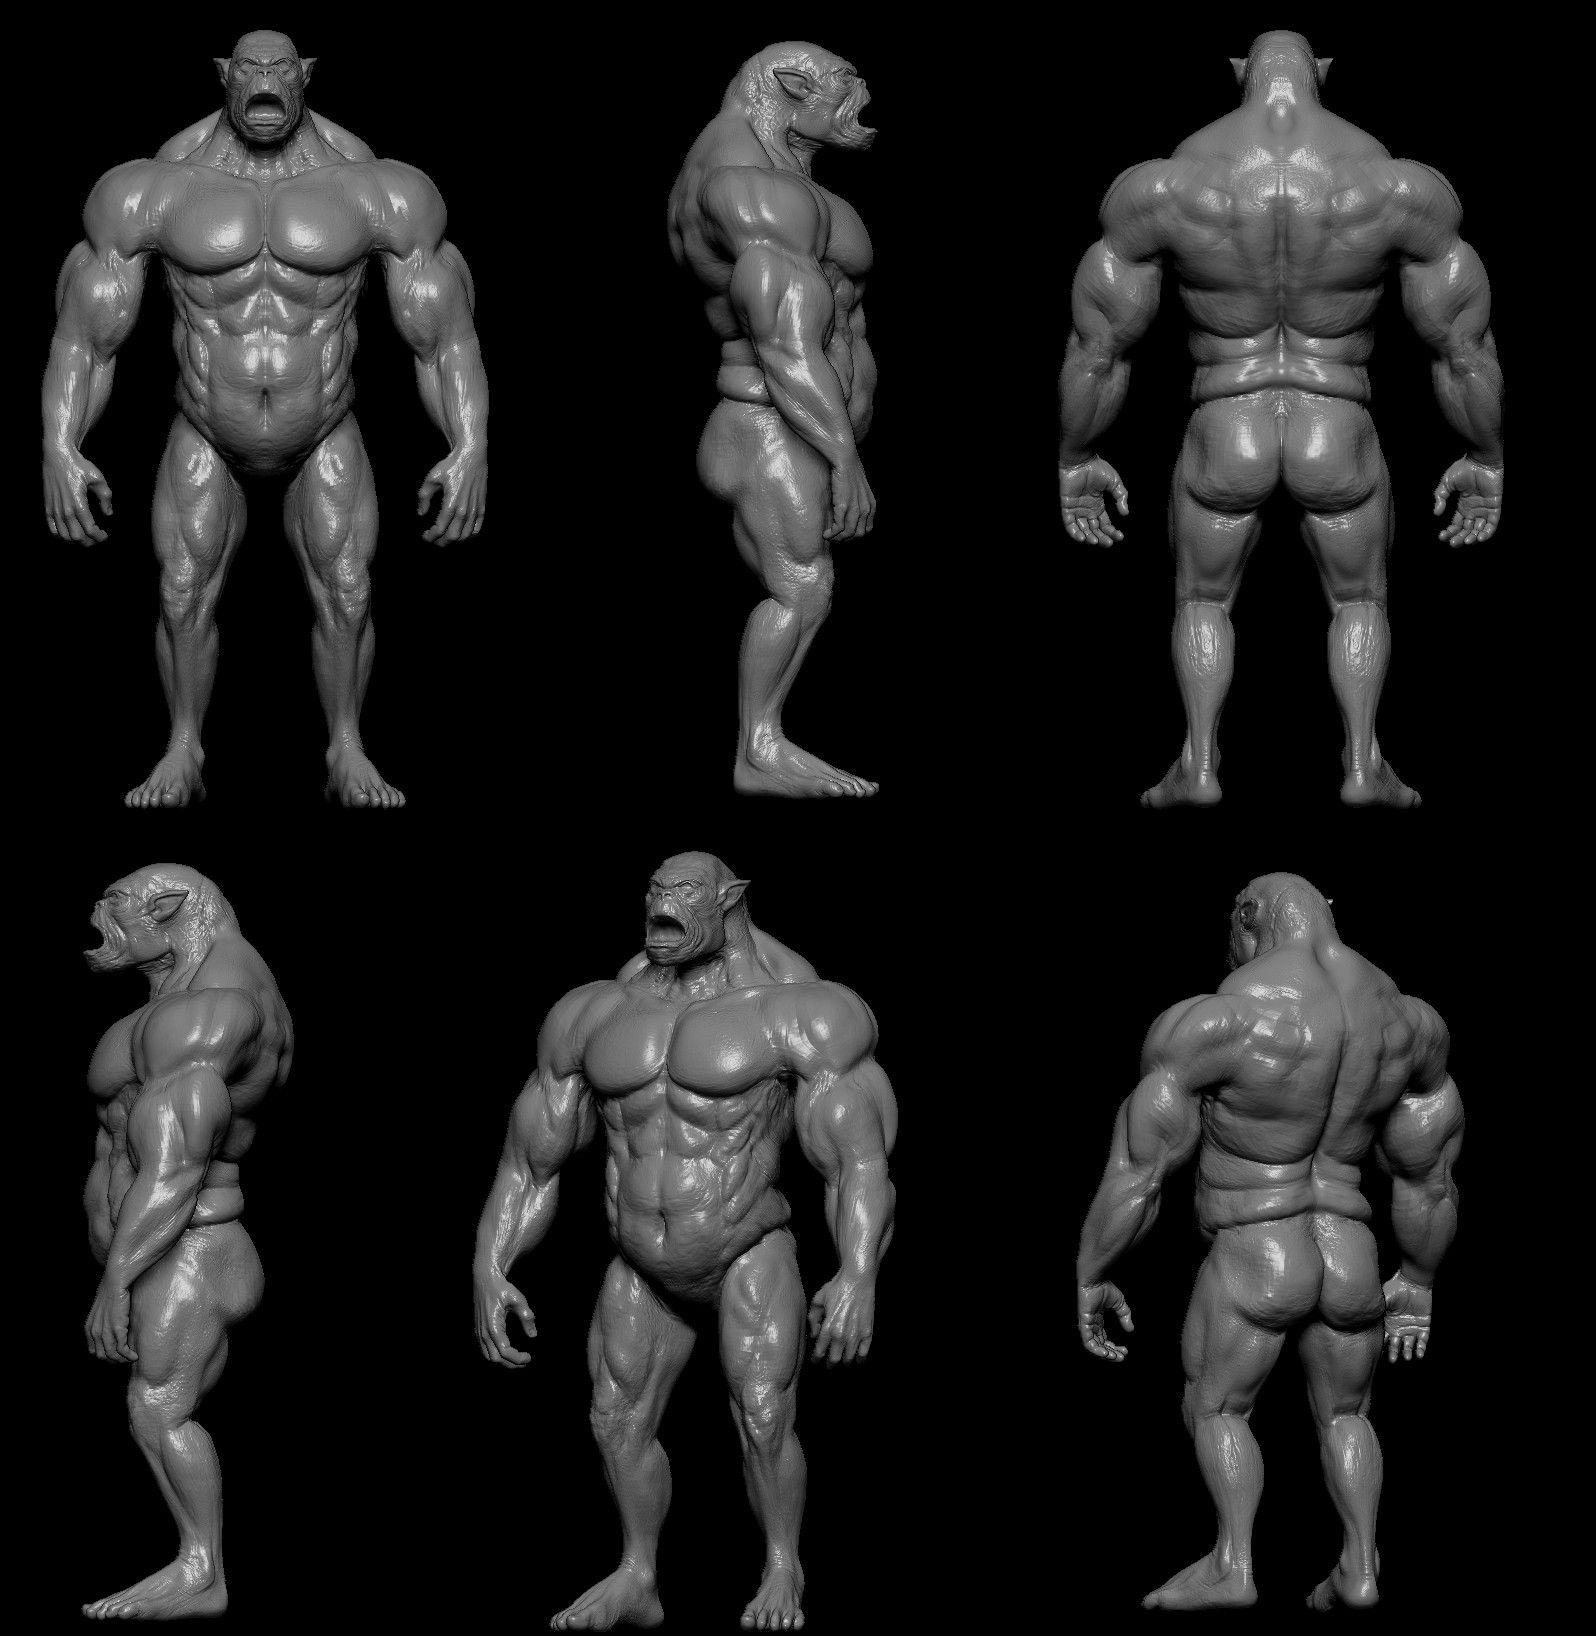 Ape Muscle Anatomy Ga3zr jpg | creature | Pinterest